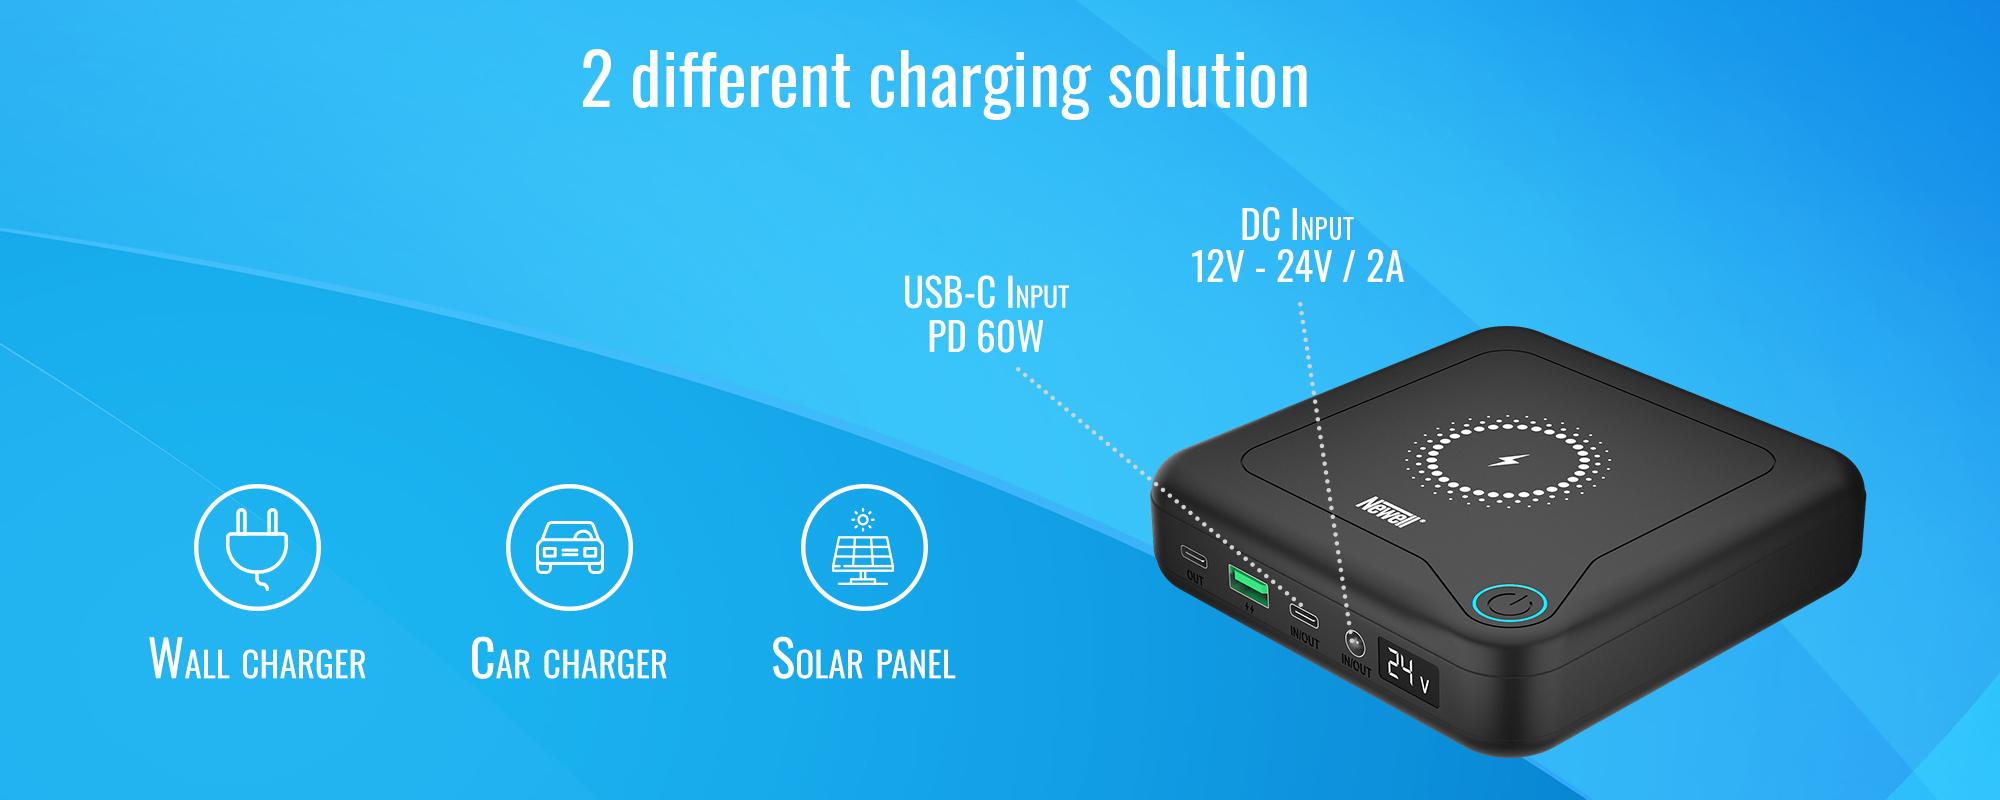 Power Bank Newell GP12 24000 mAh PD 60 W